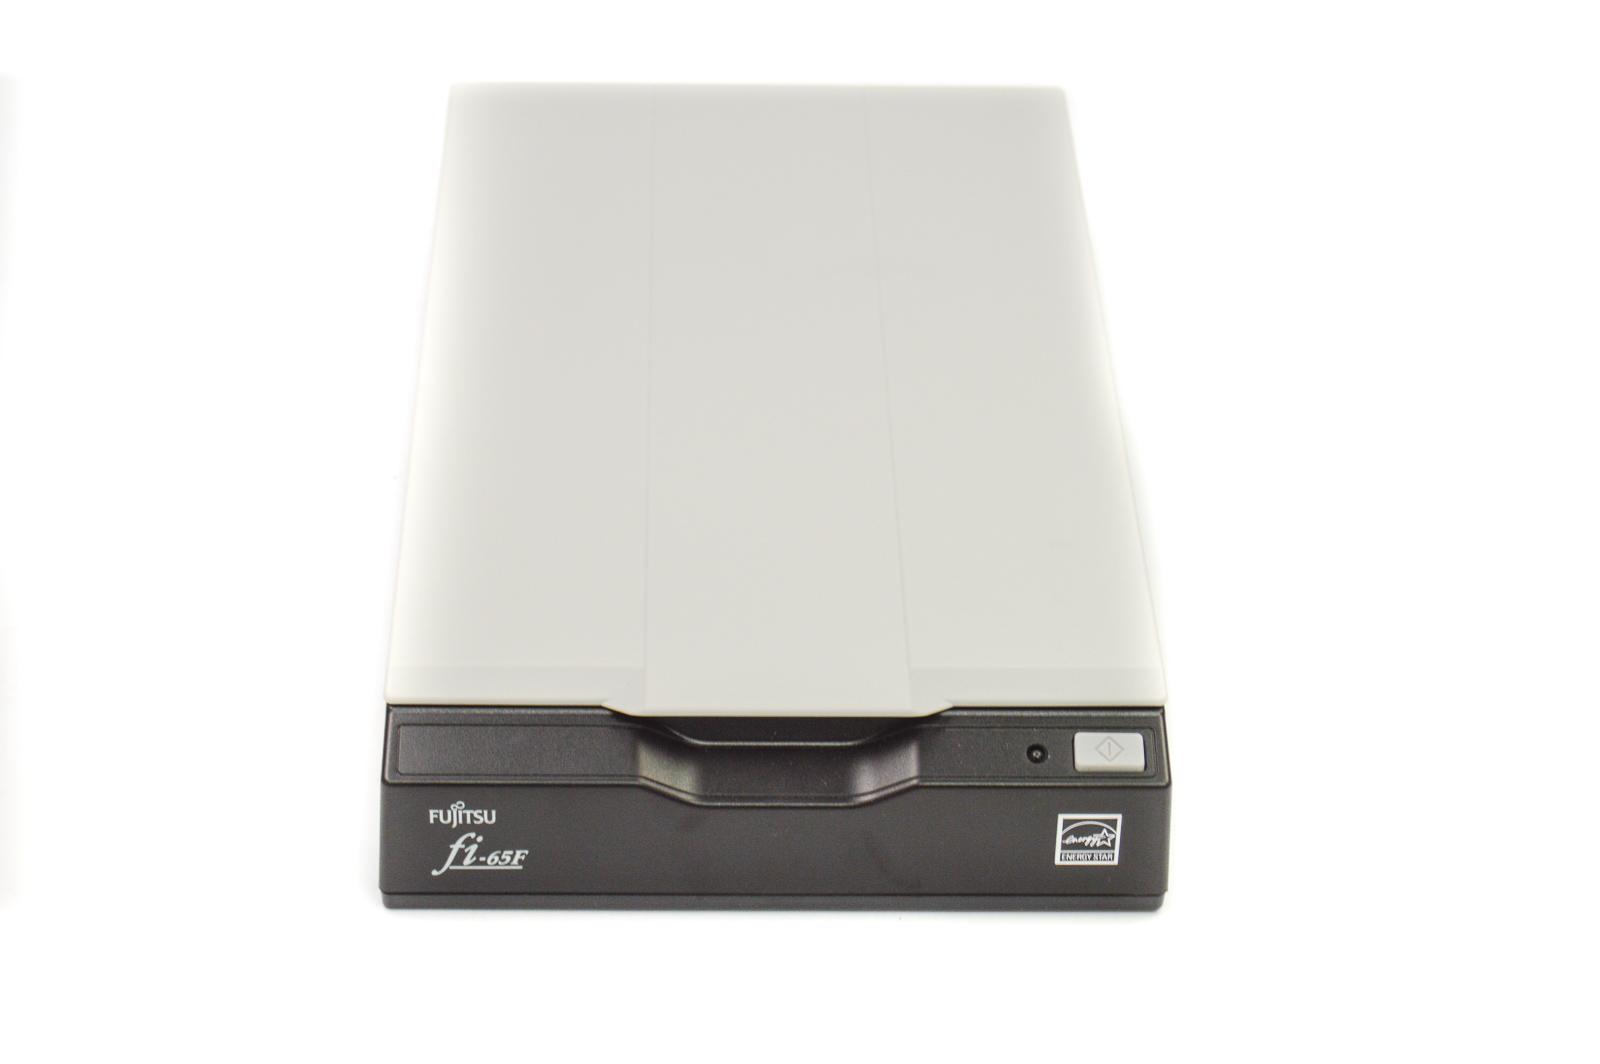 Fujitsu fi-65F A6 Image Scanner Flatbed 600 dpi